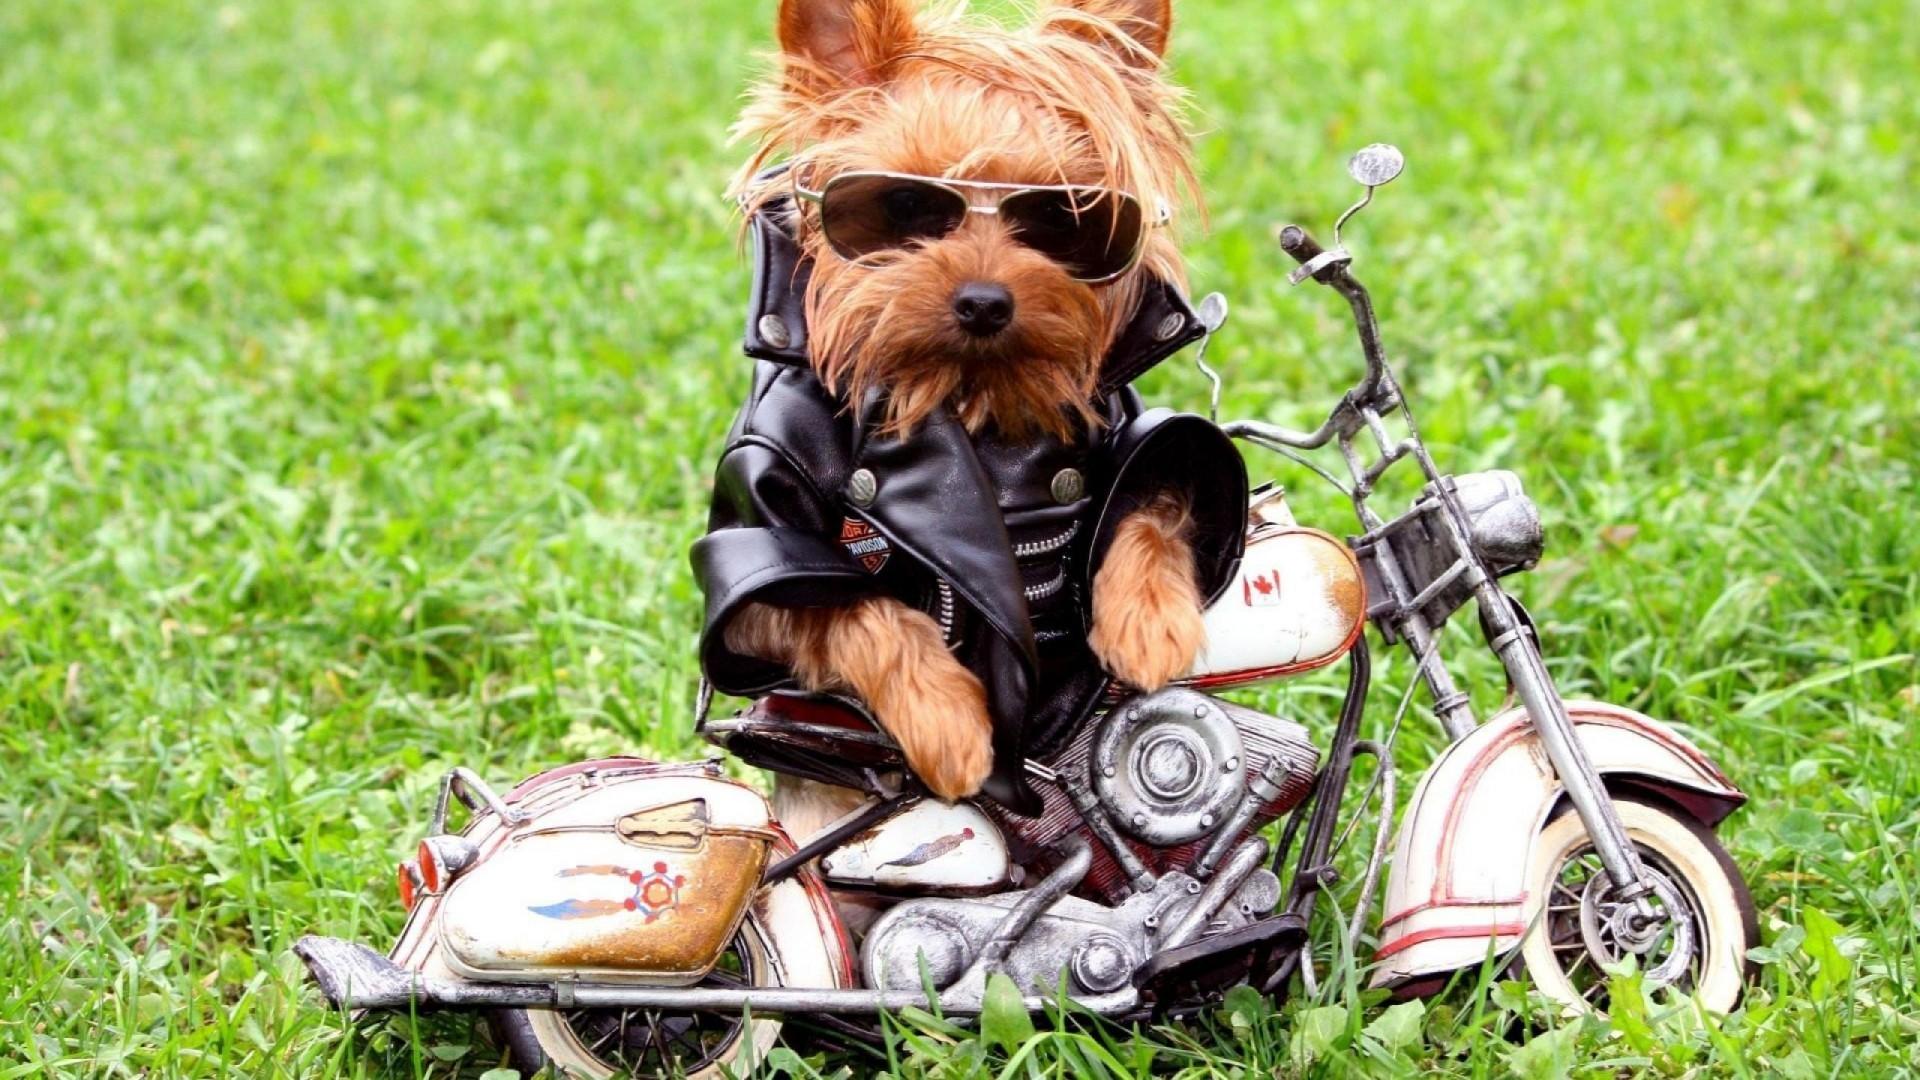 Dog Funny Free HD Wallpapers   Download Free Desktop Wallpaper Images .